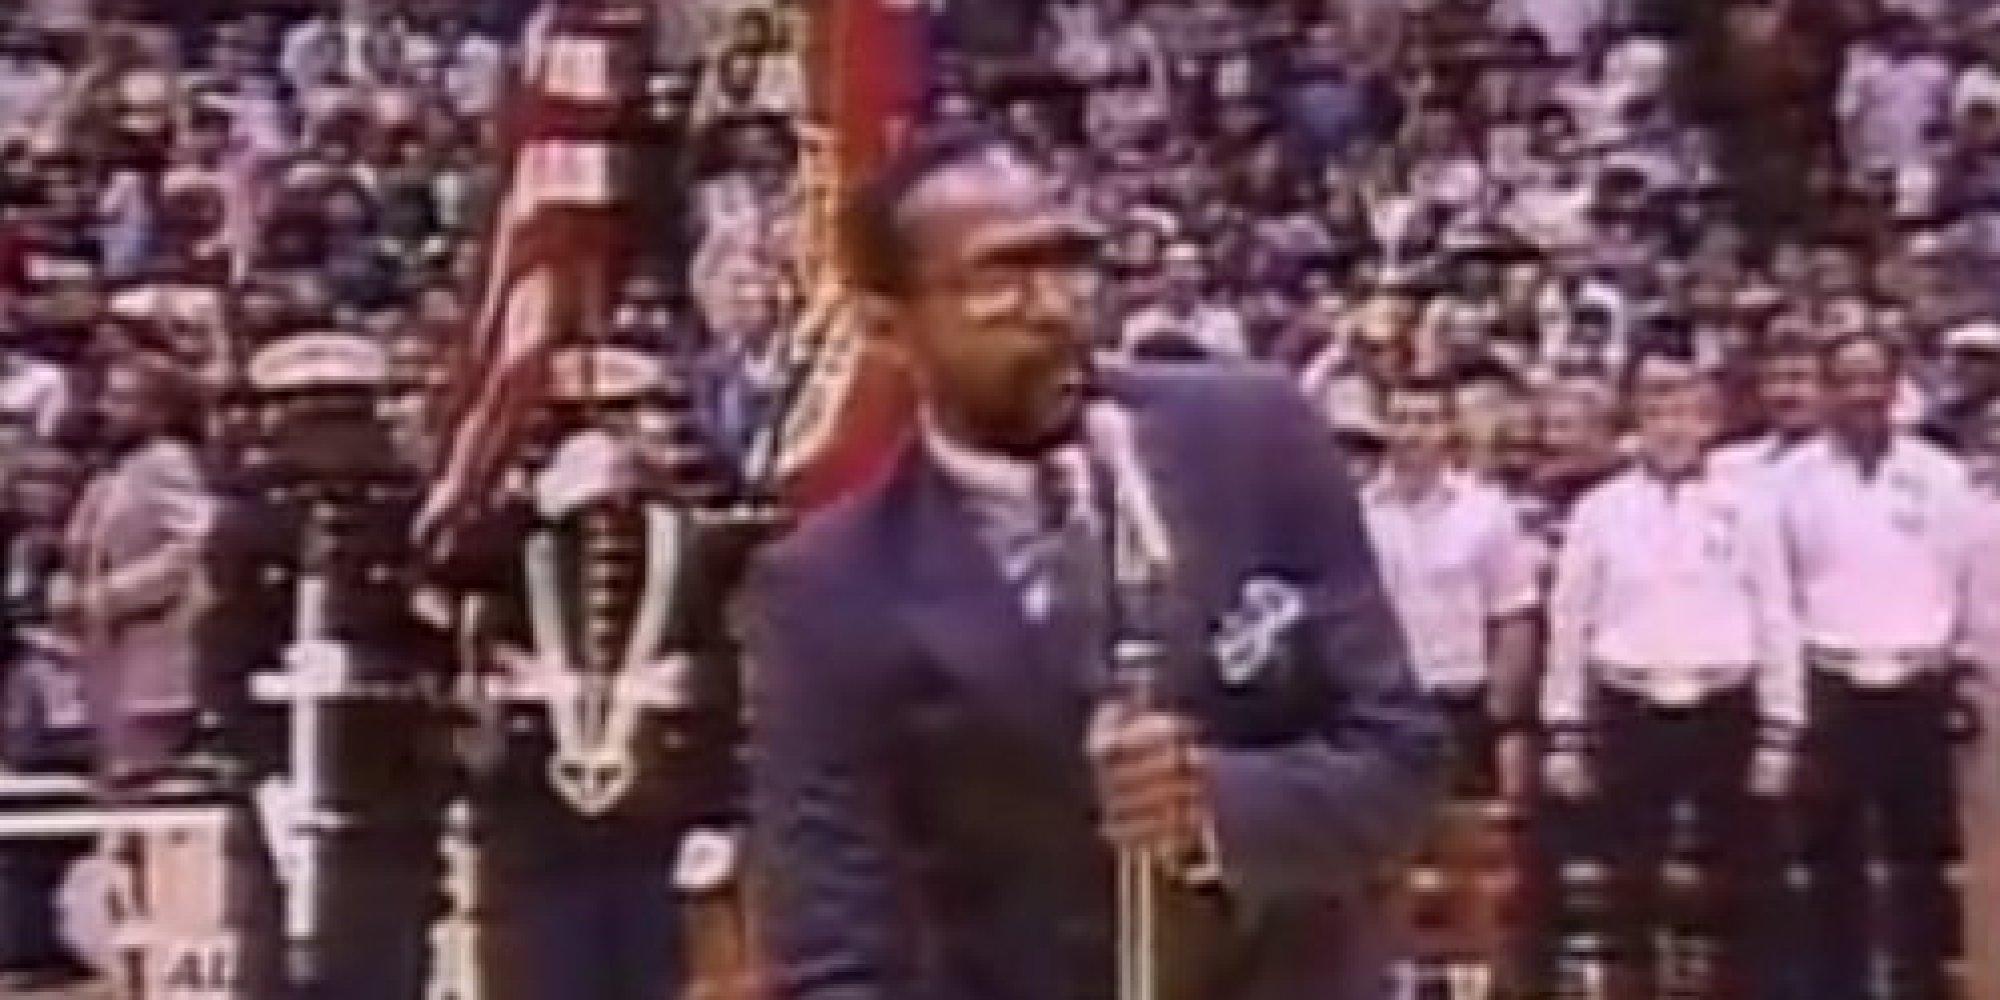 Marvin gay national anthem 1983